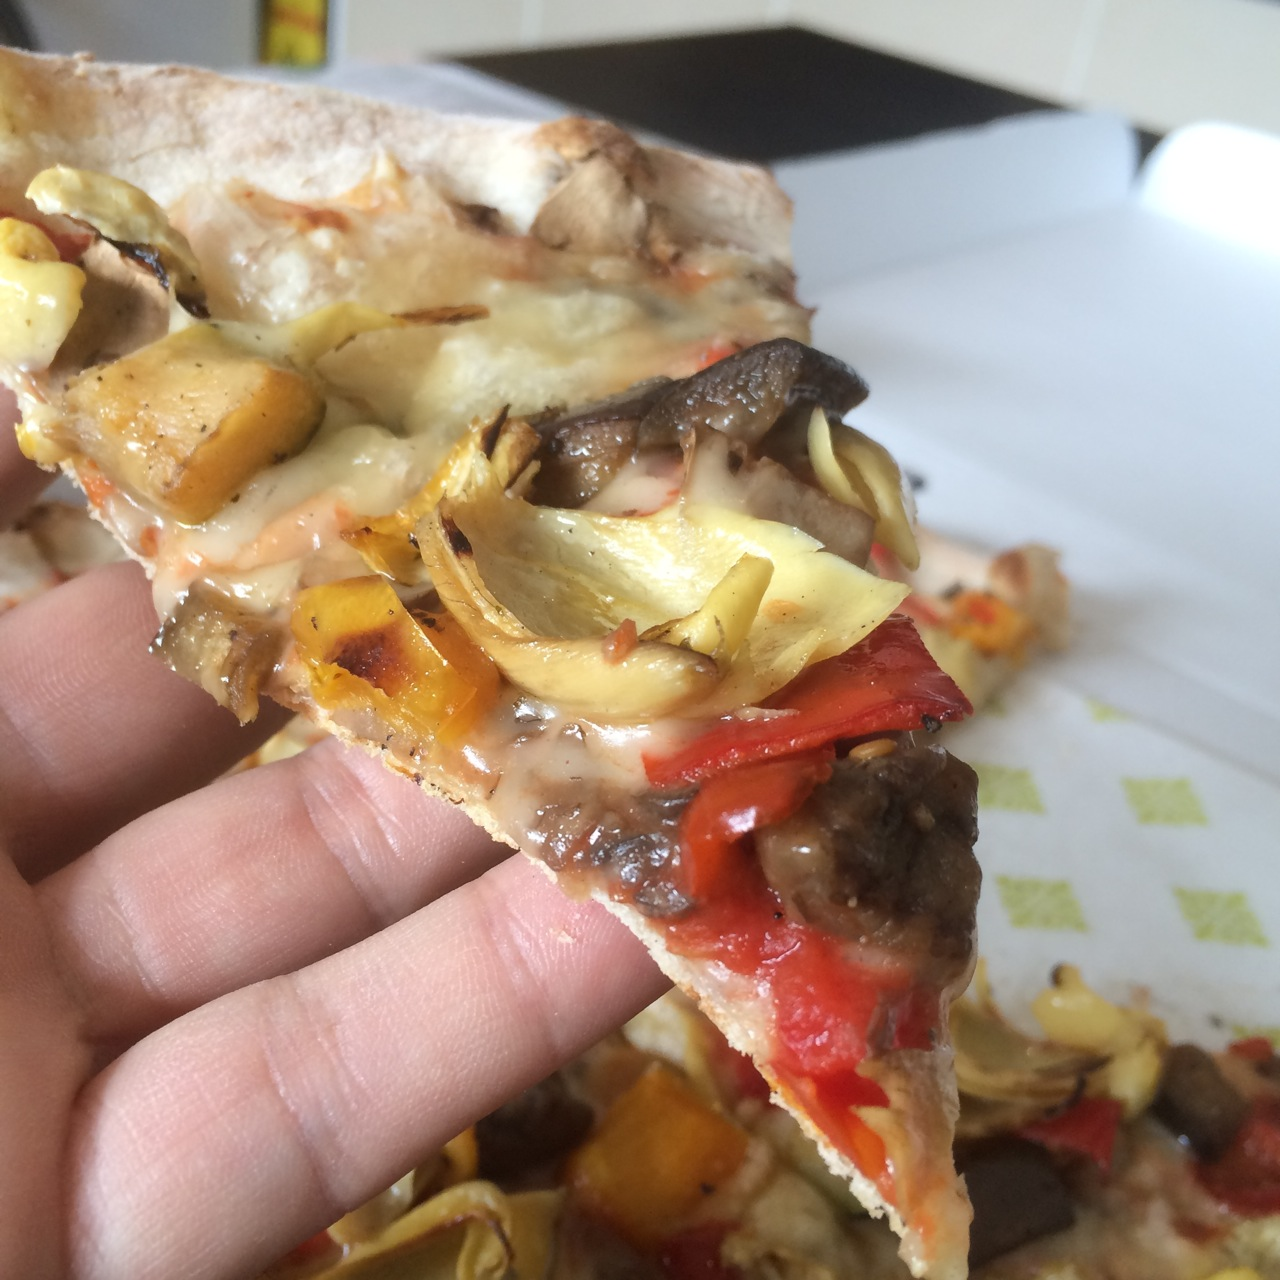 https://i0.wp.com/fatgayvegan.com/wp-content/uploads/2015/09/vegan-pizza-slice-firezza.jpg?fit=1280%2C1280